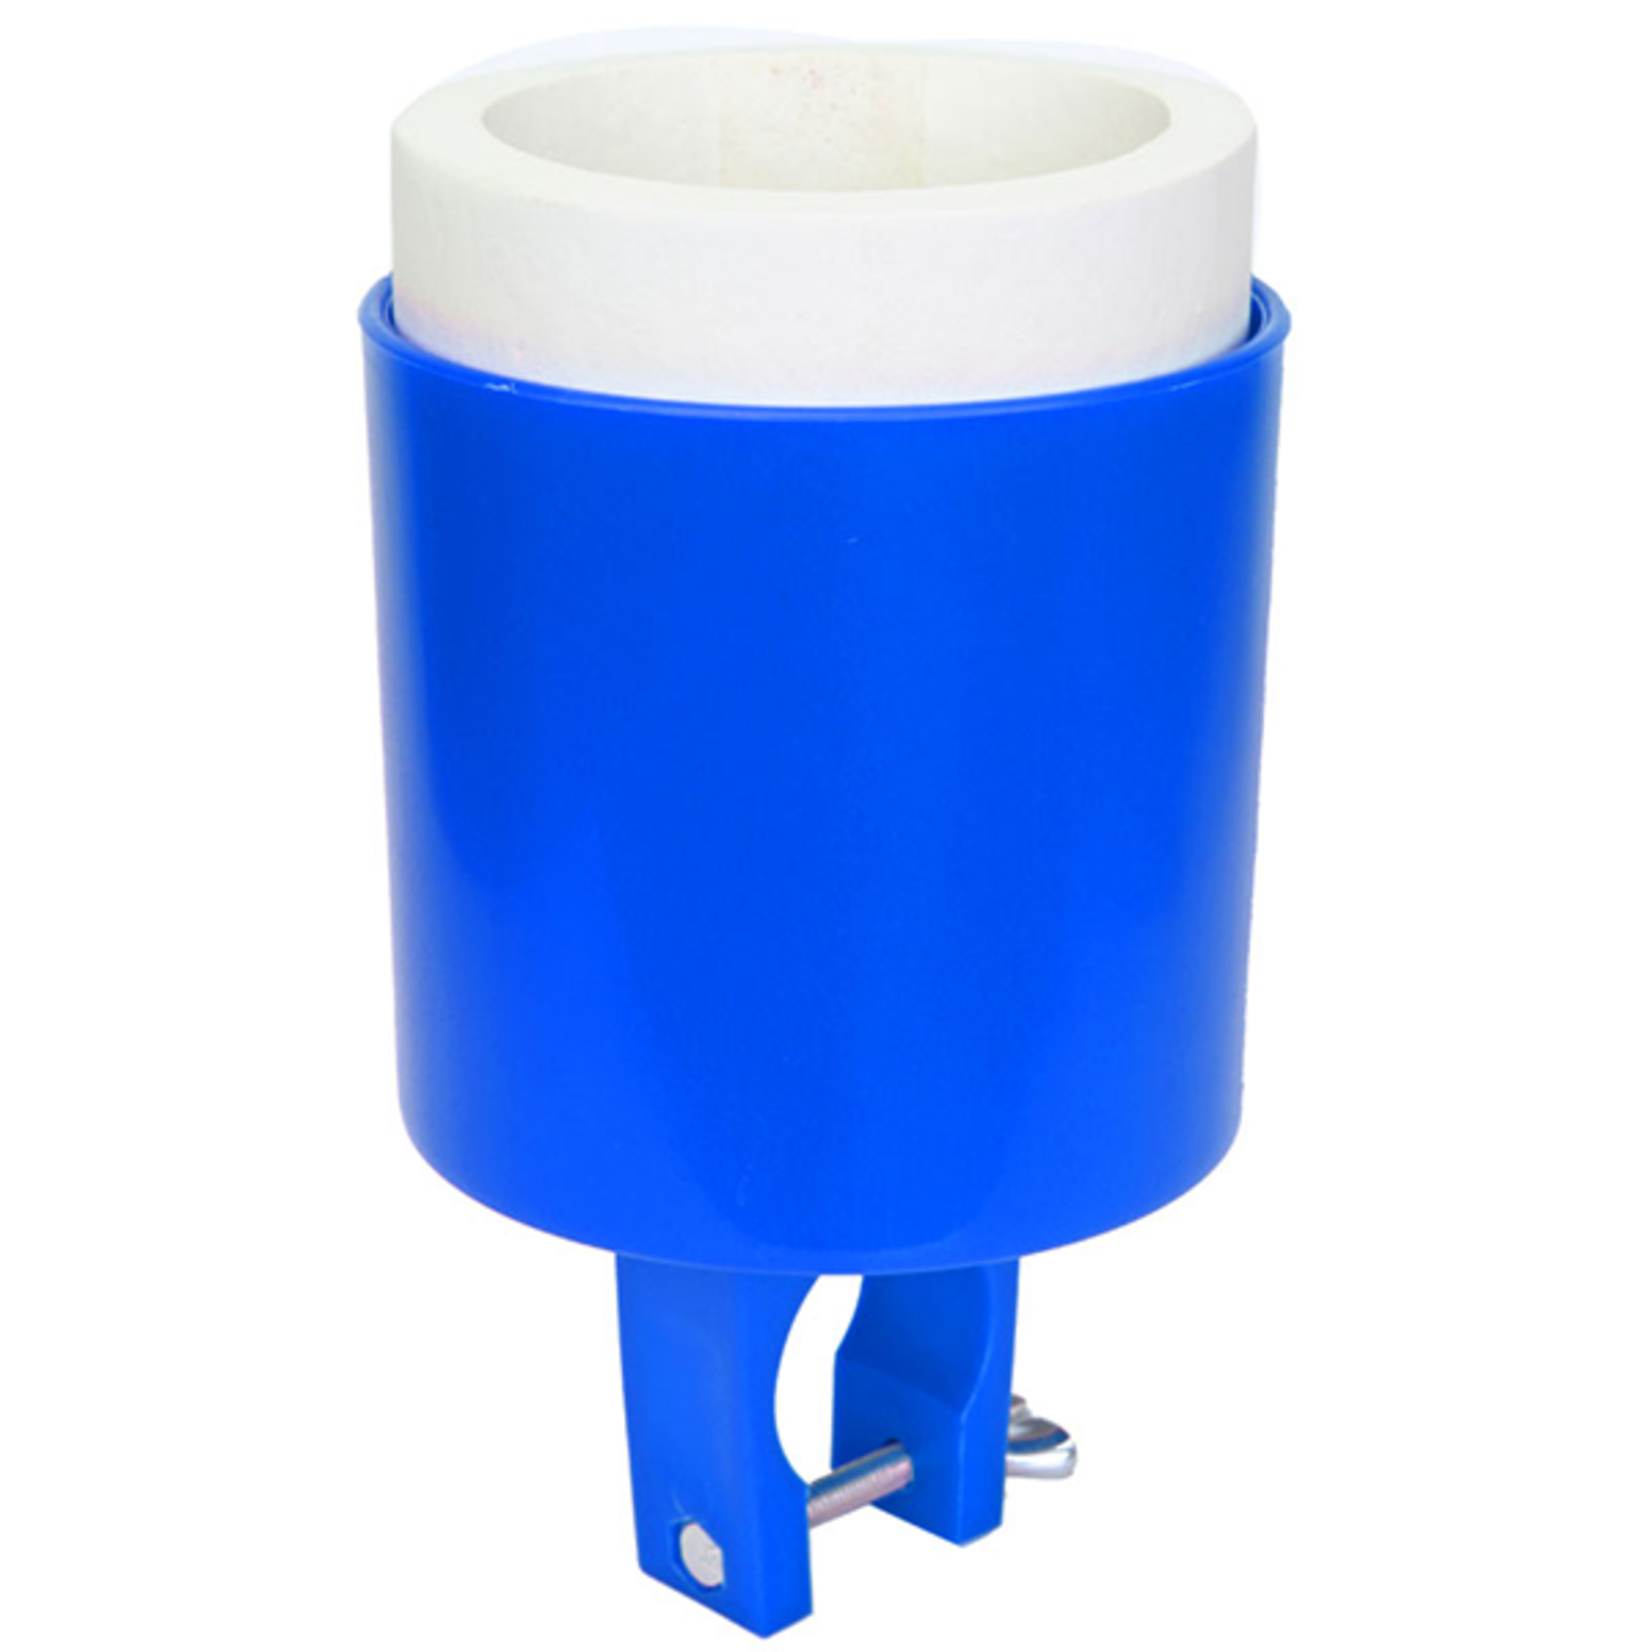 Sunlite DRINK HOLDER SUNLT CAN-2-GO BLU